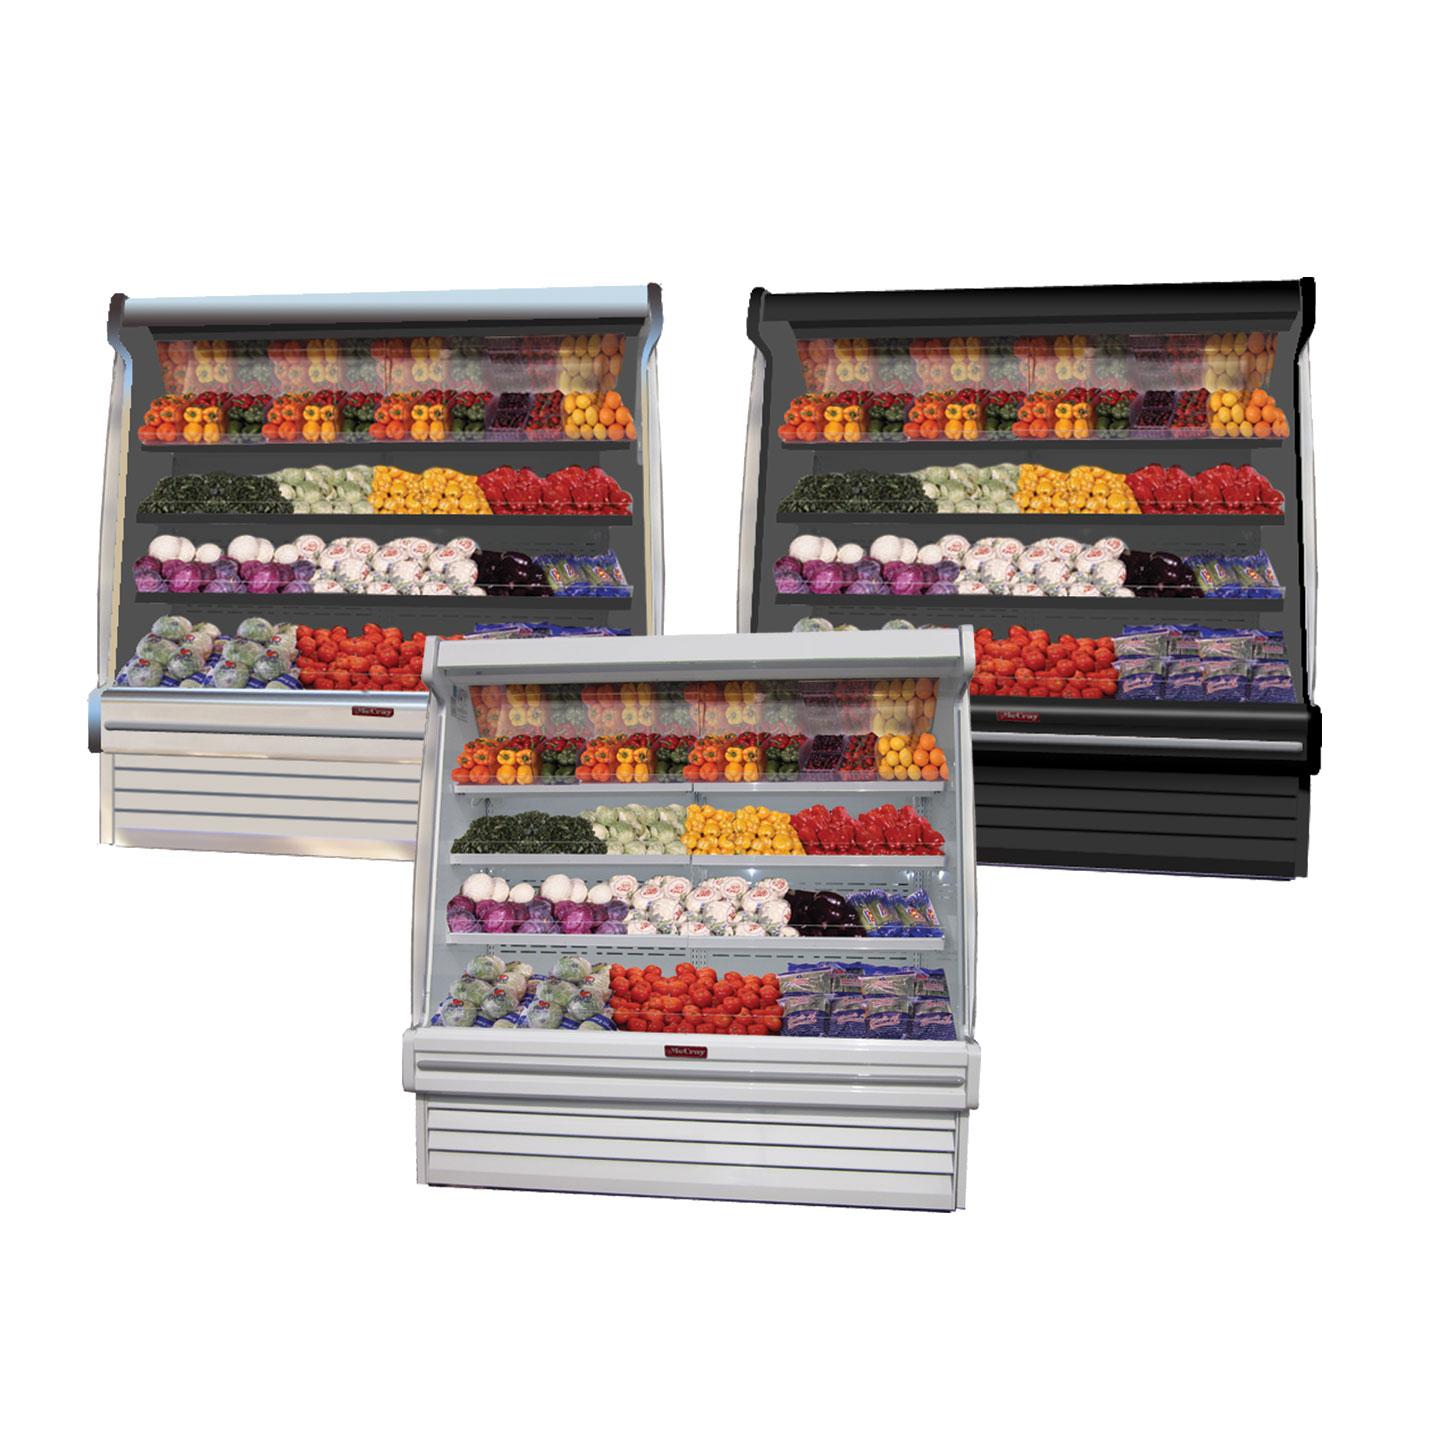 Howard-McCray R-OP35E-6S-B-LED display case, produce